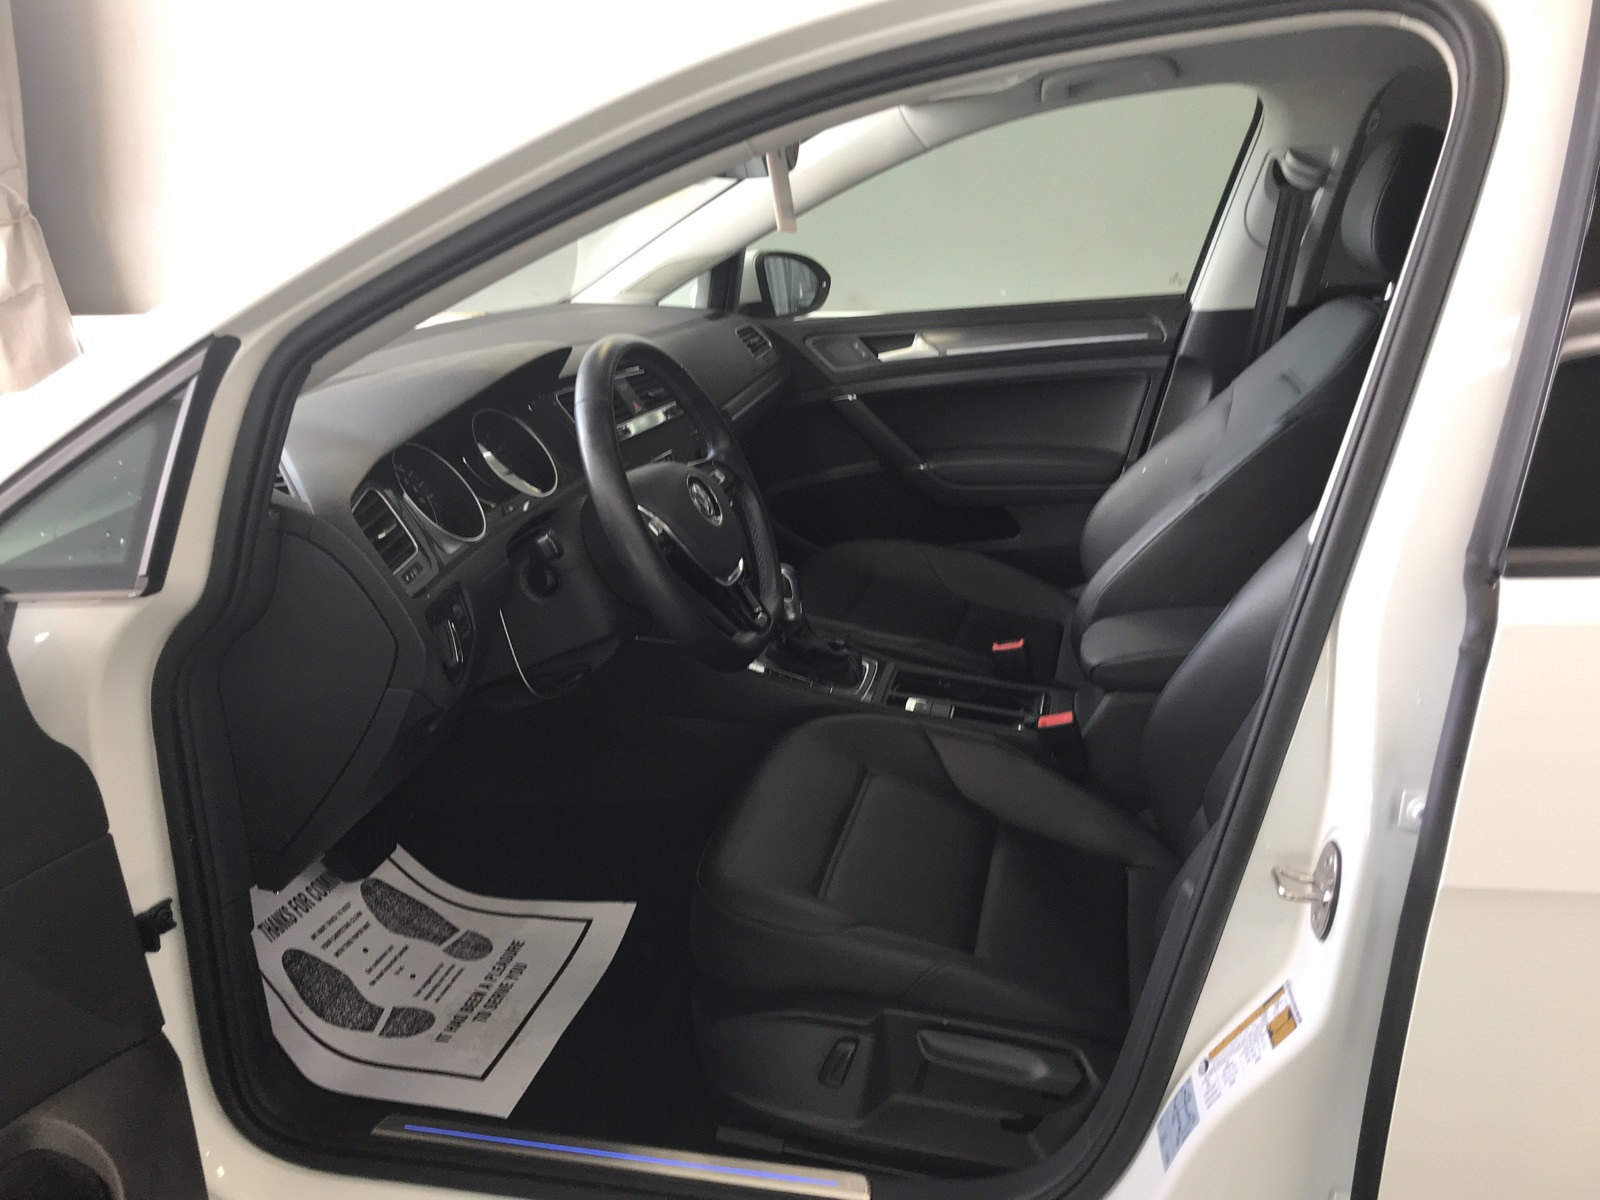 http://autocredit.com.ua/electro-cars/uploads/6/21-02-20/U2zleY_ikRJB34NuQ.jpeg